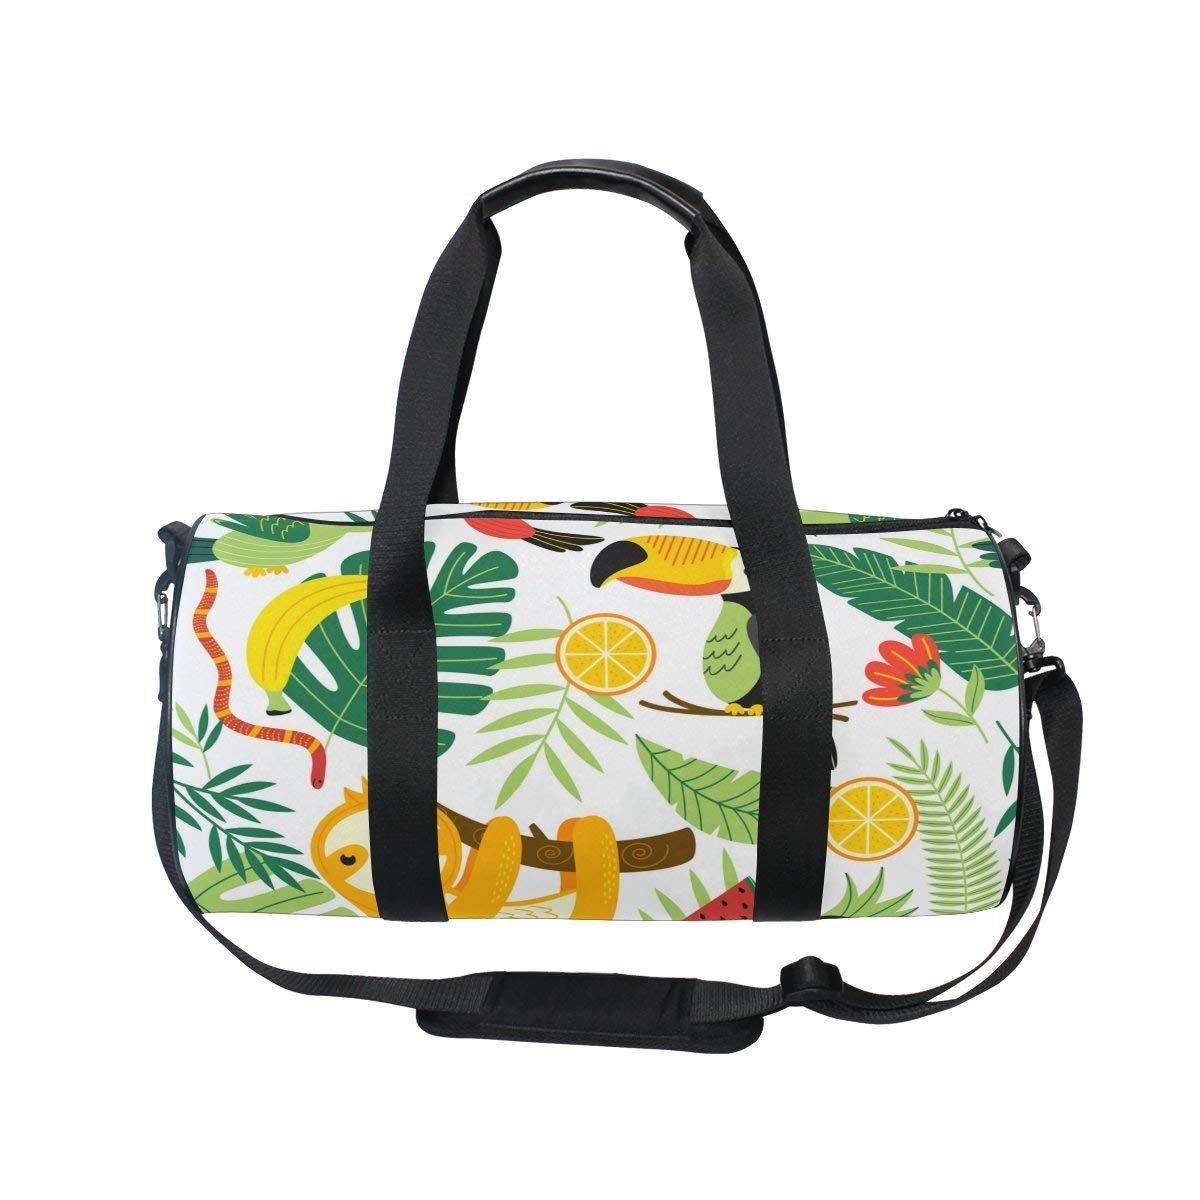 oulianレディースジムバッグトロピカルパイナップルナマケモノMens CampダッフルバッグDuffle Luggage Travel Bag  picture1 B07F72JLWJ